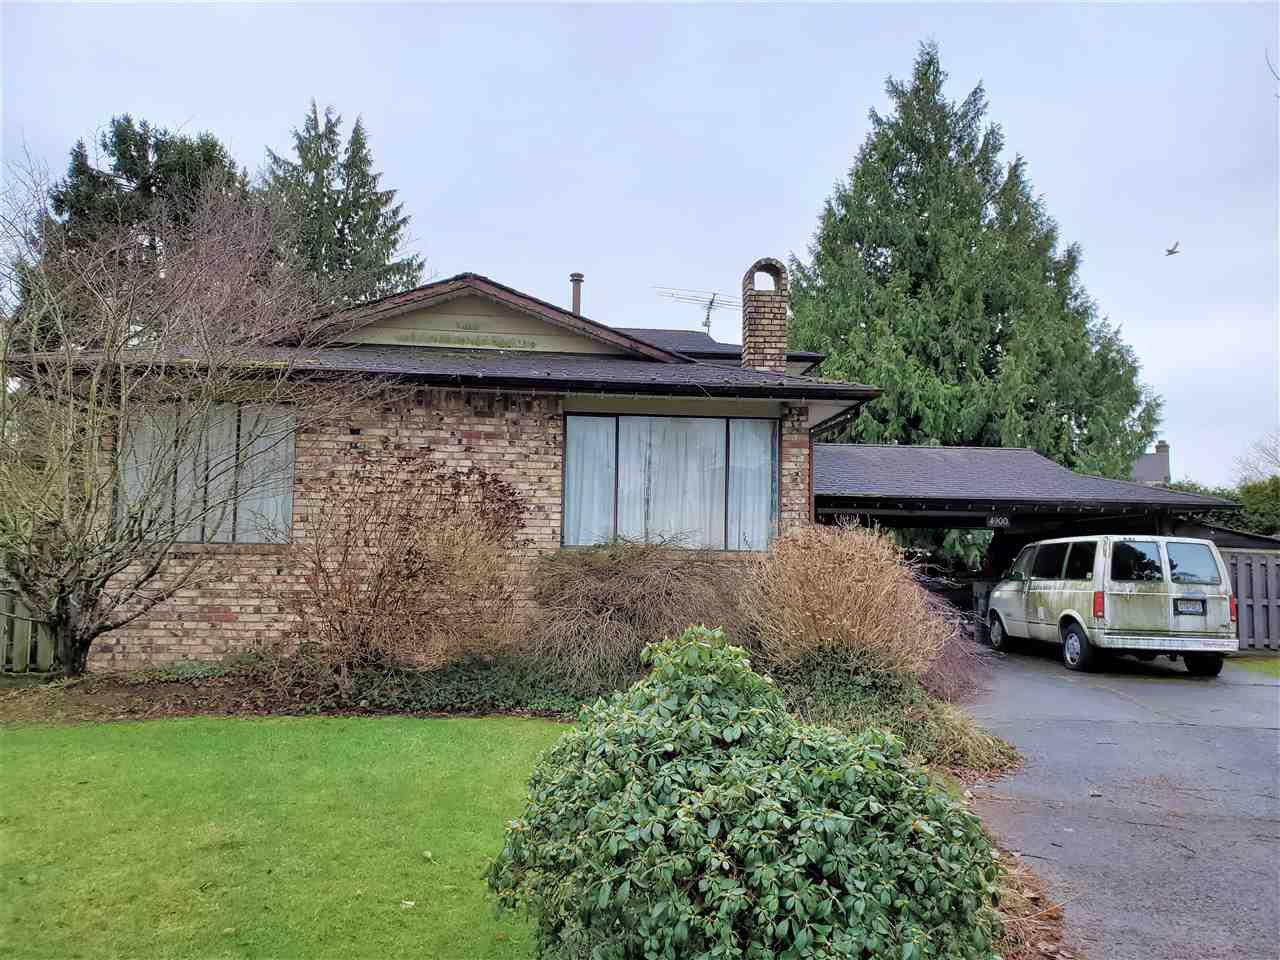 Main Photo: 4900 FORTUNE Avenue in Richmond: Steveston North House for sale : MLS®# R2432774